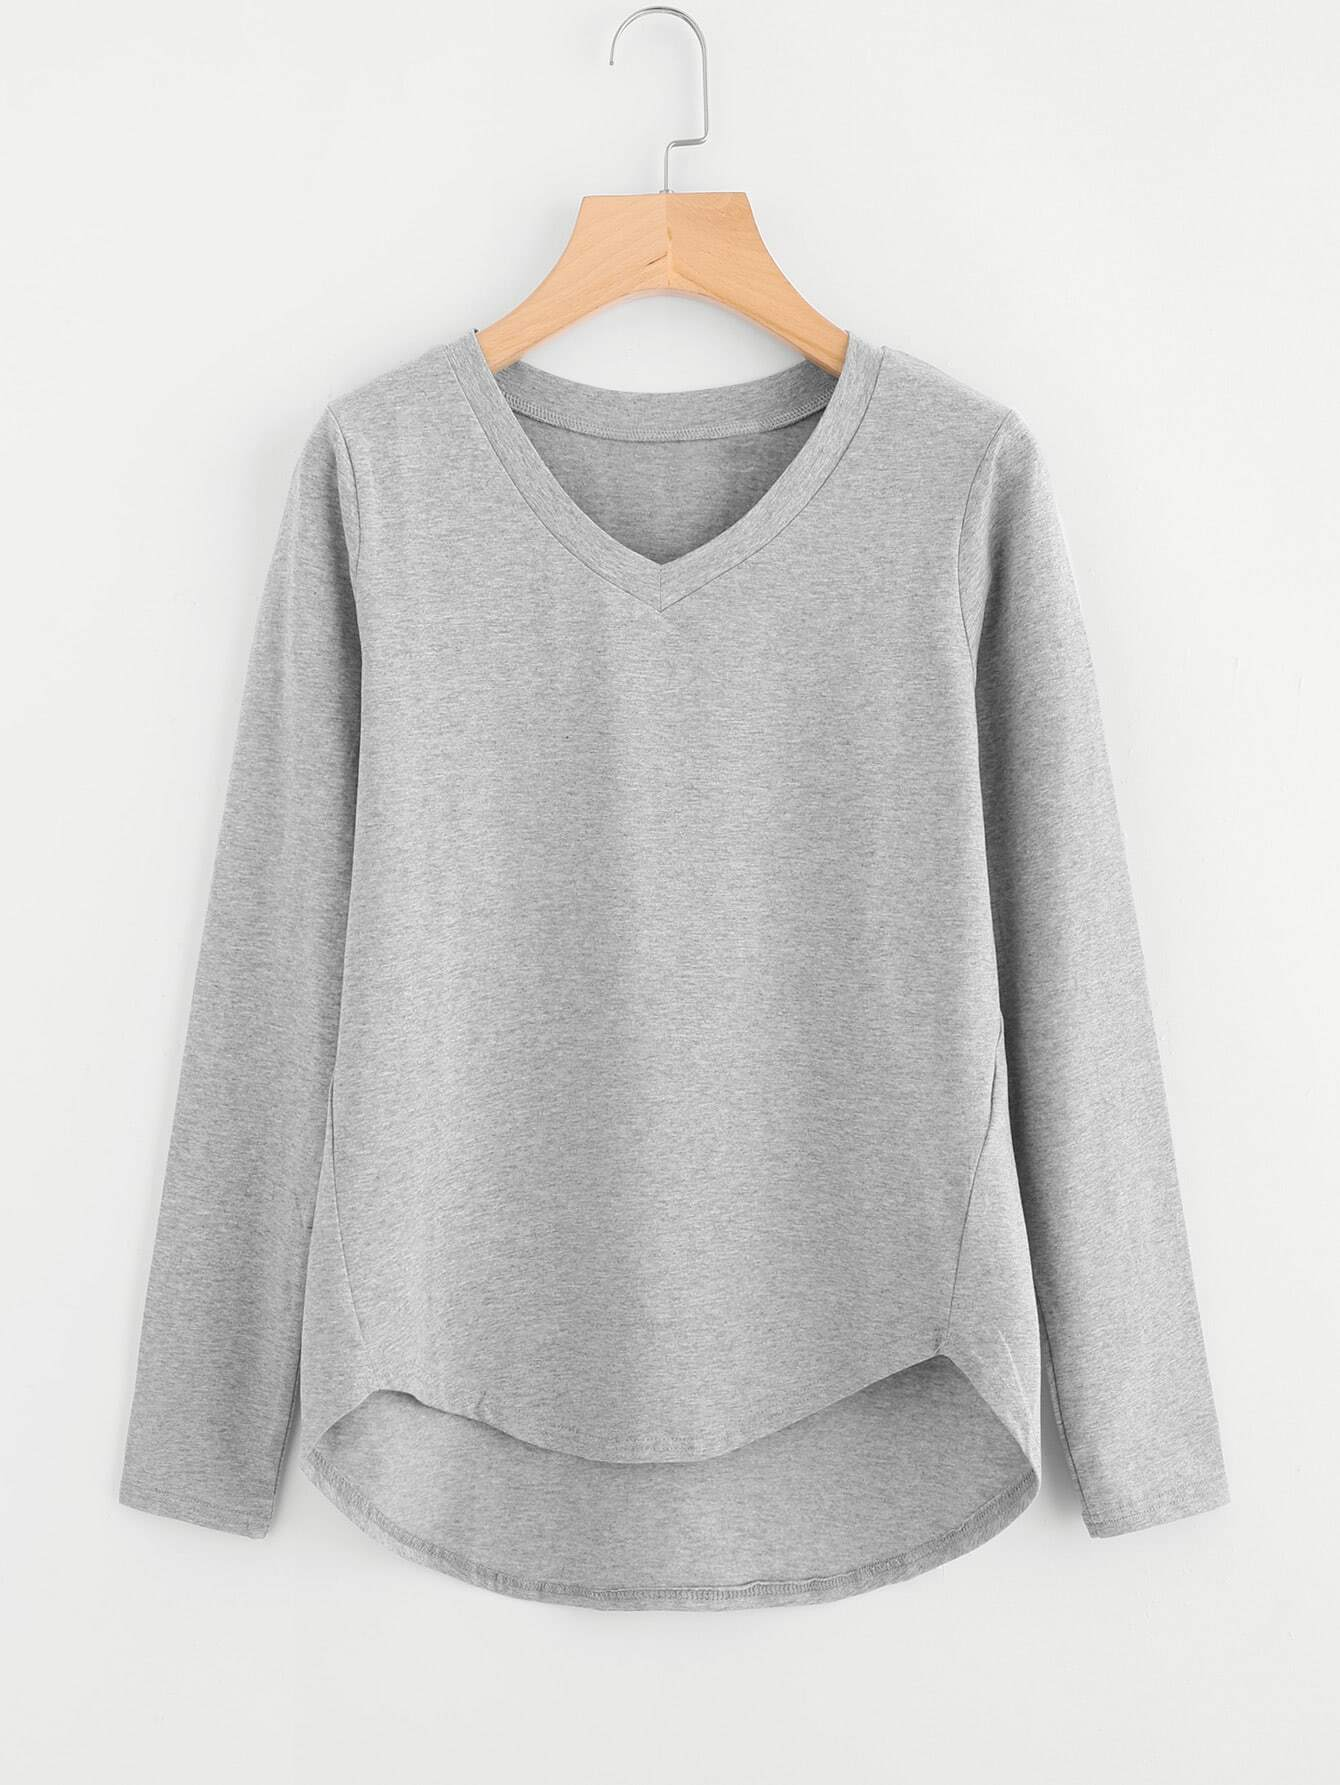 Heather Knit Dip Hem T-shirt heather knit dolphin hem tee dress